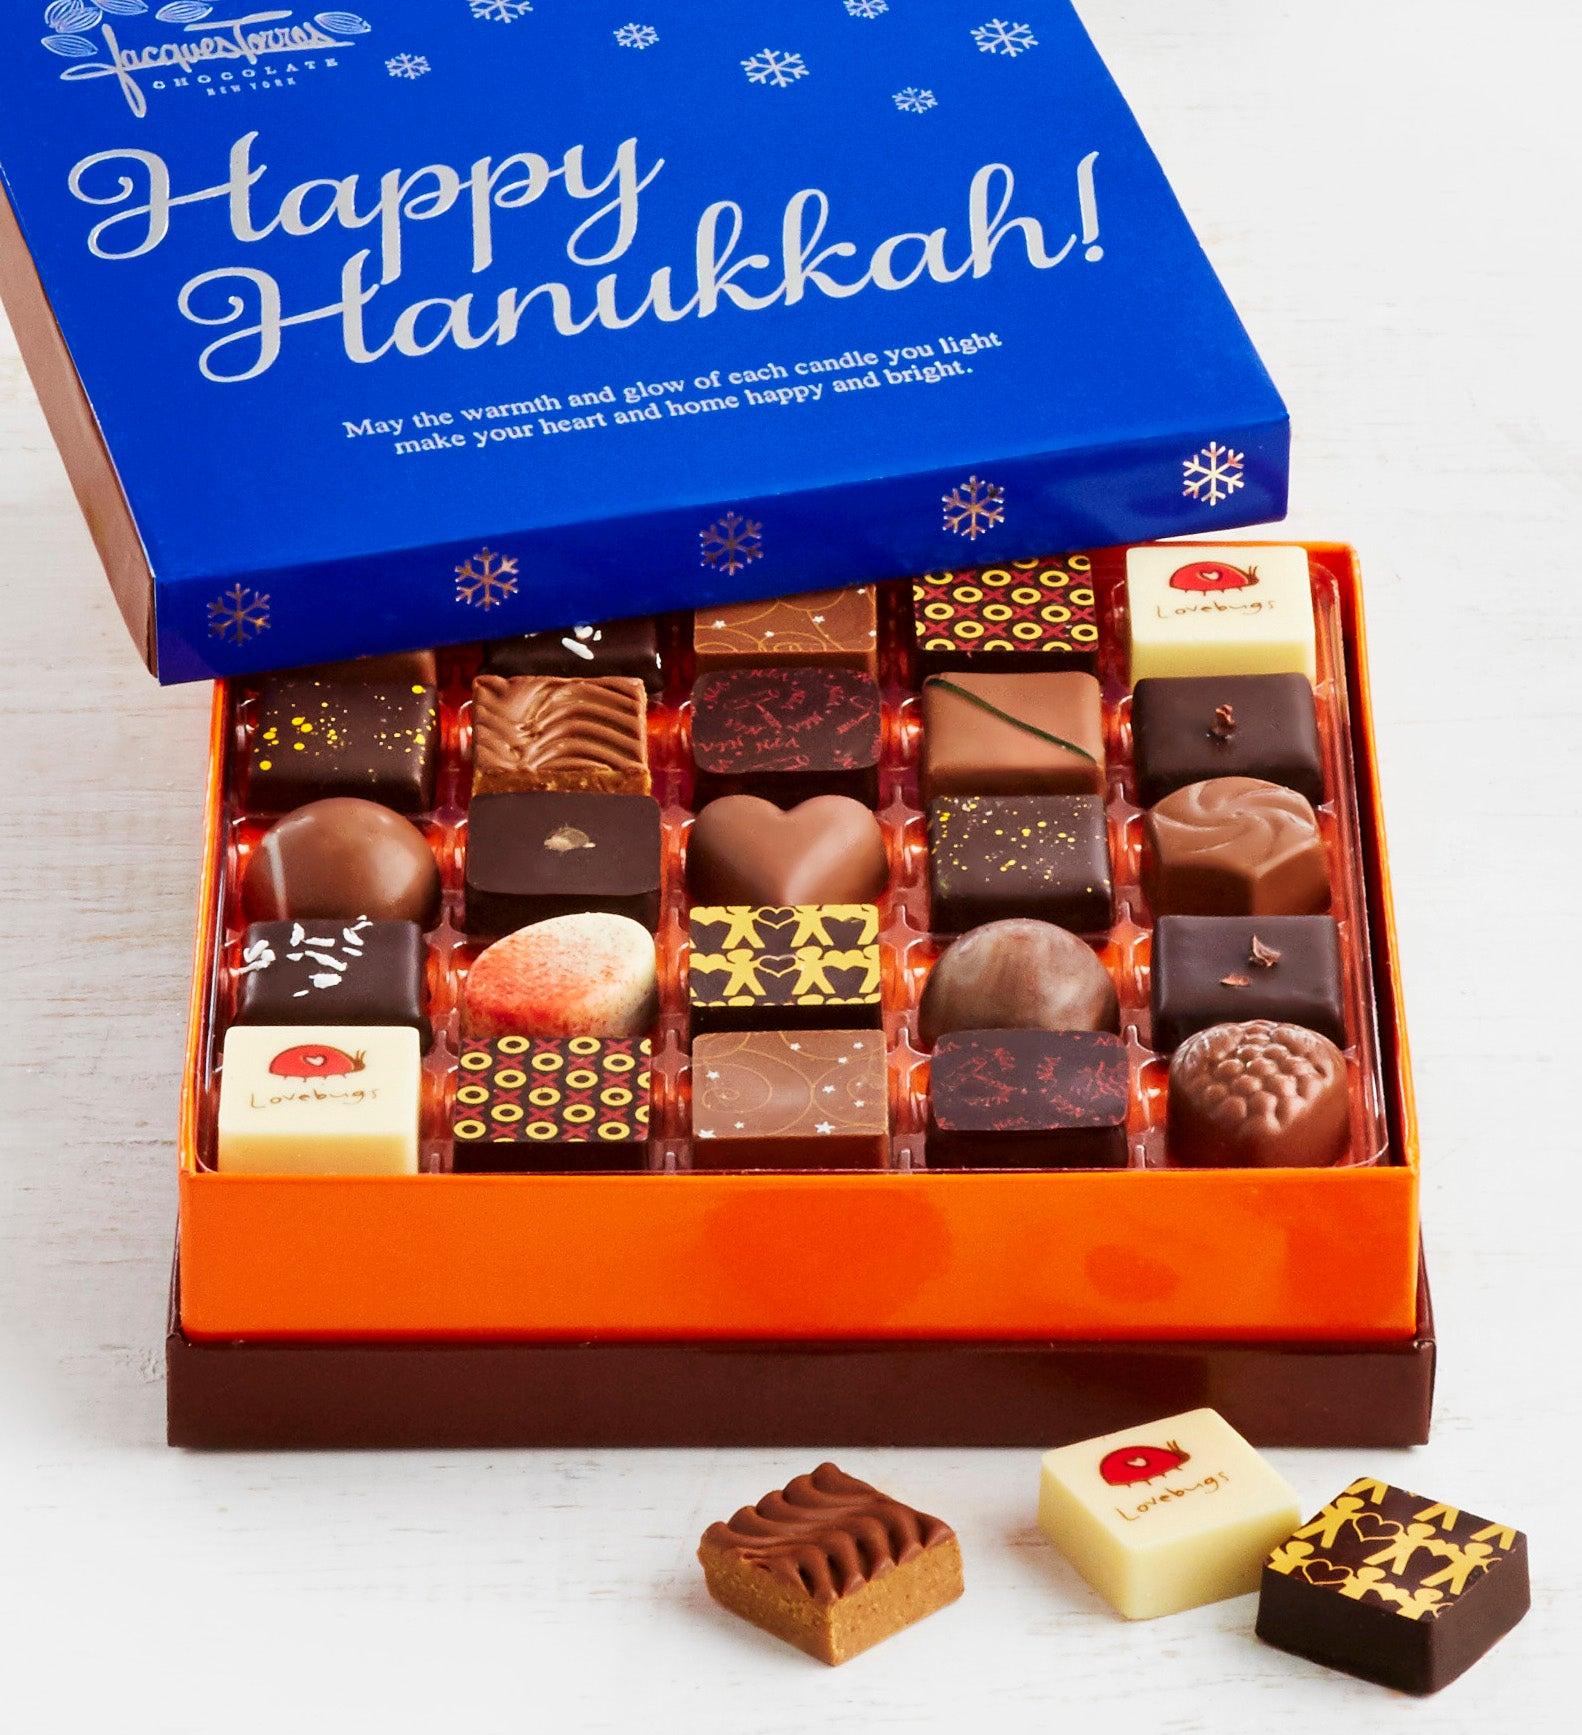 Jacques Torres Hanukkah Chocolates Box pc